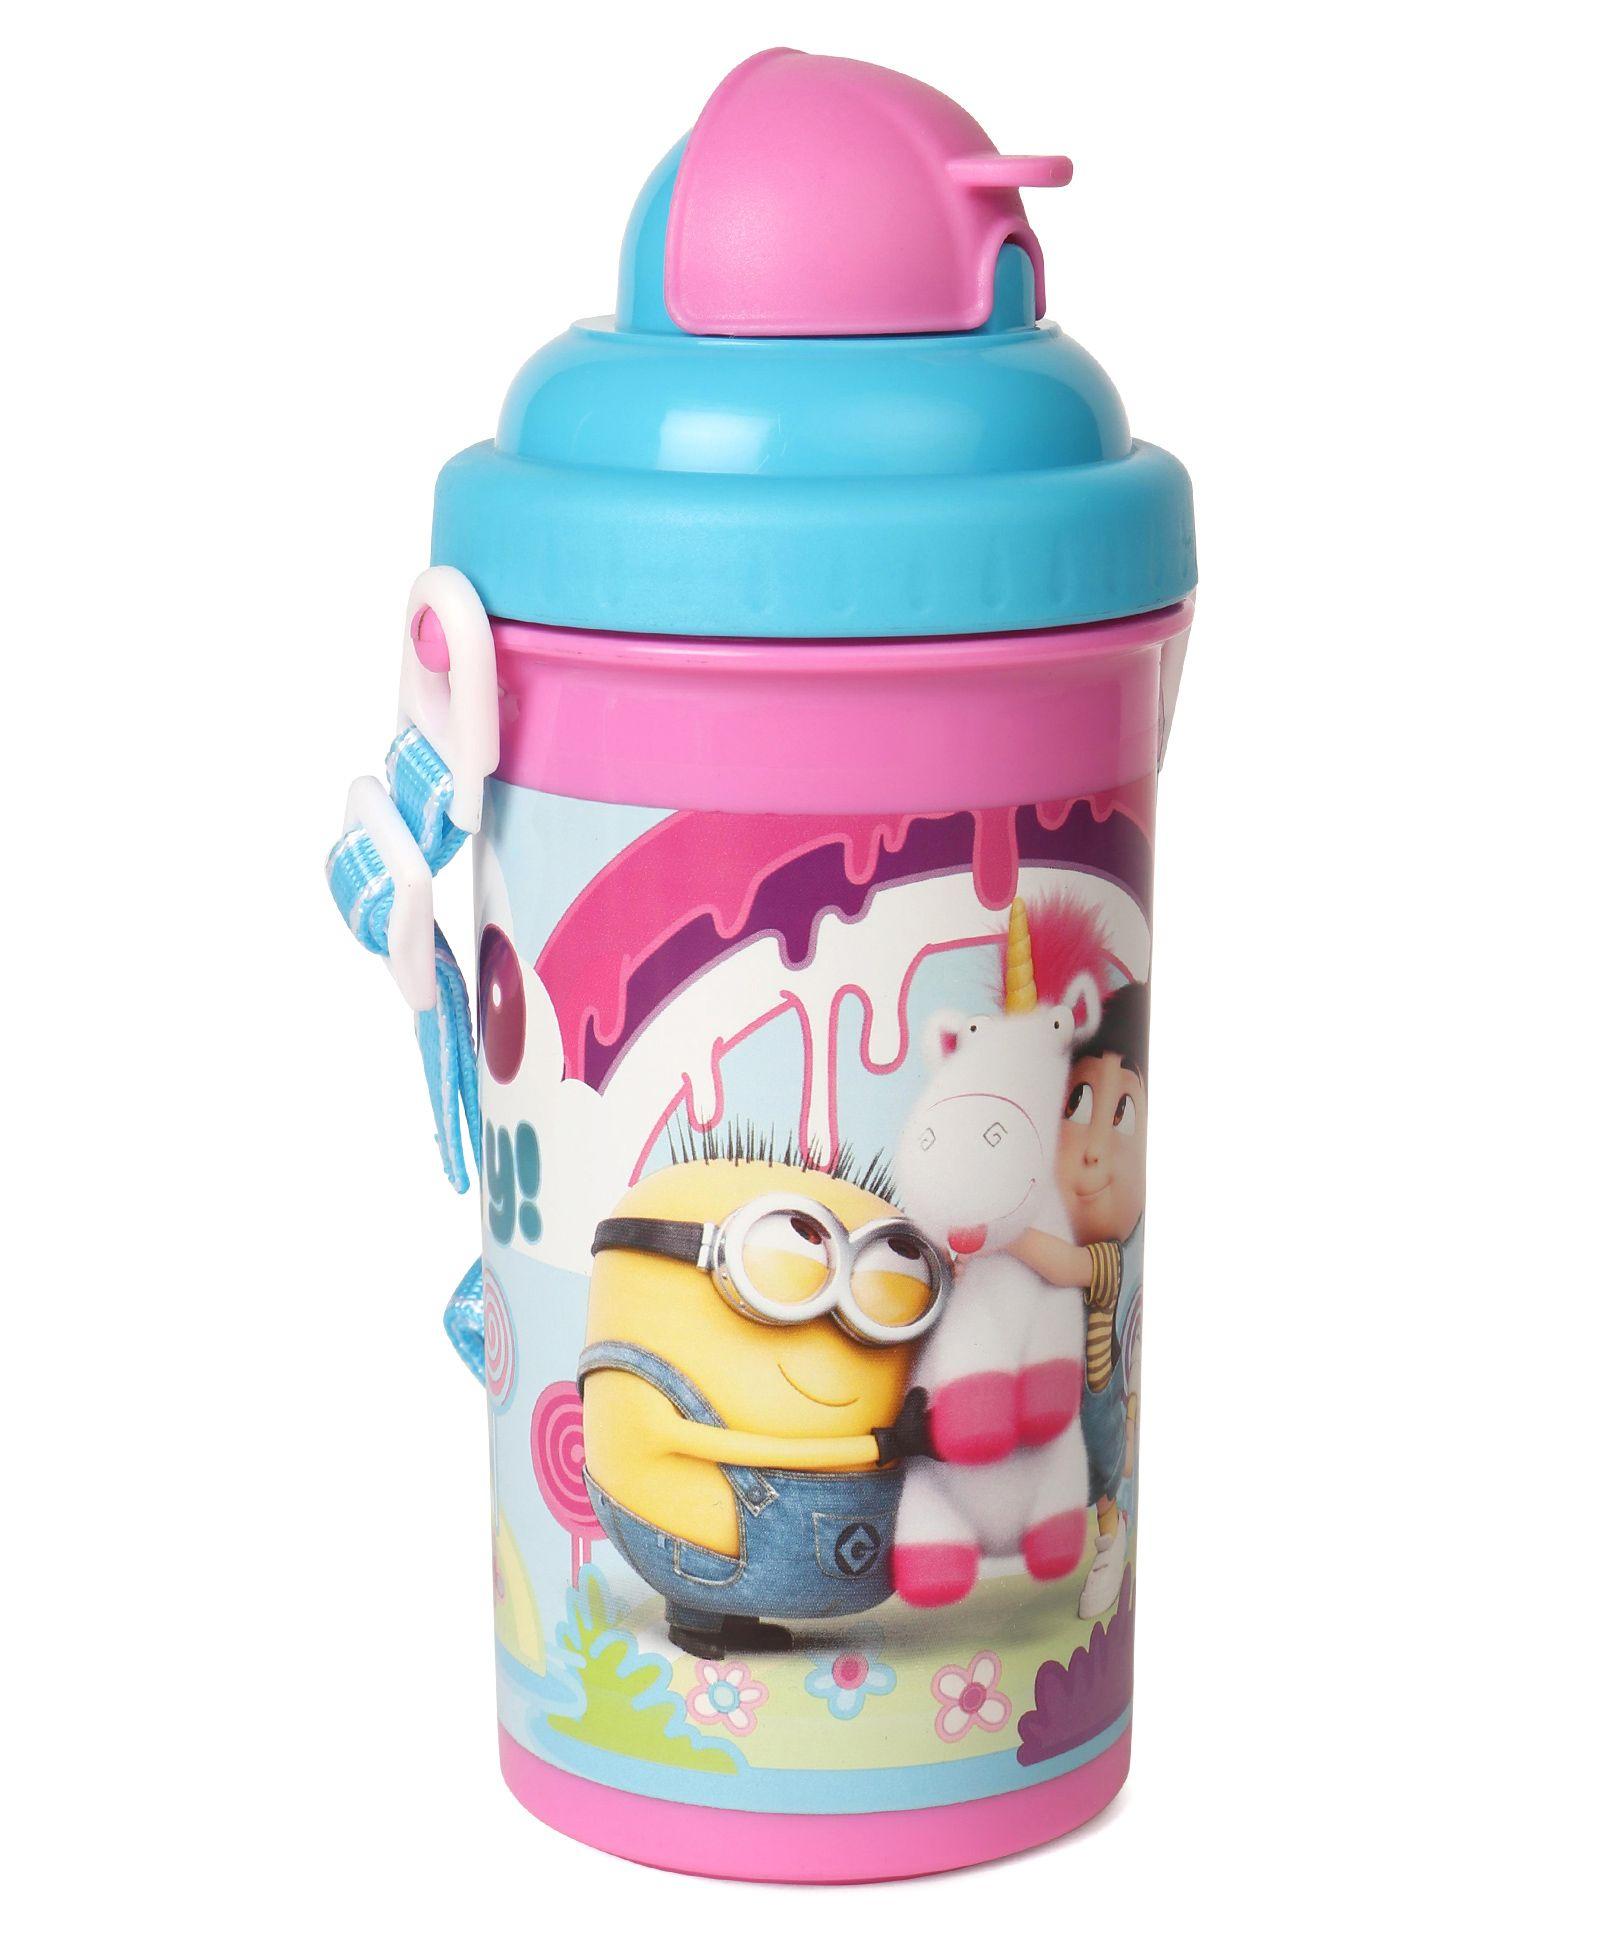 1fc2c34b3f Minions Unicorn & Agnes Water Bottle With Pop Up Straw Pink Blue - 500 ml